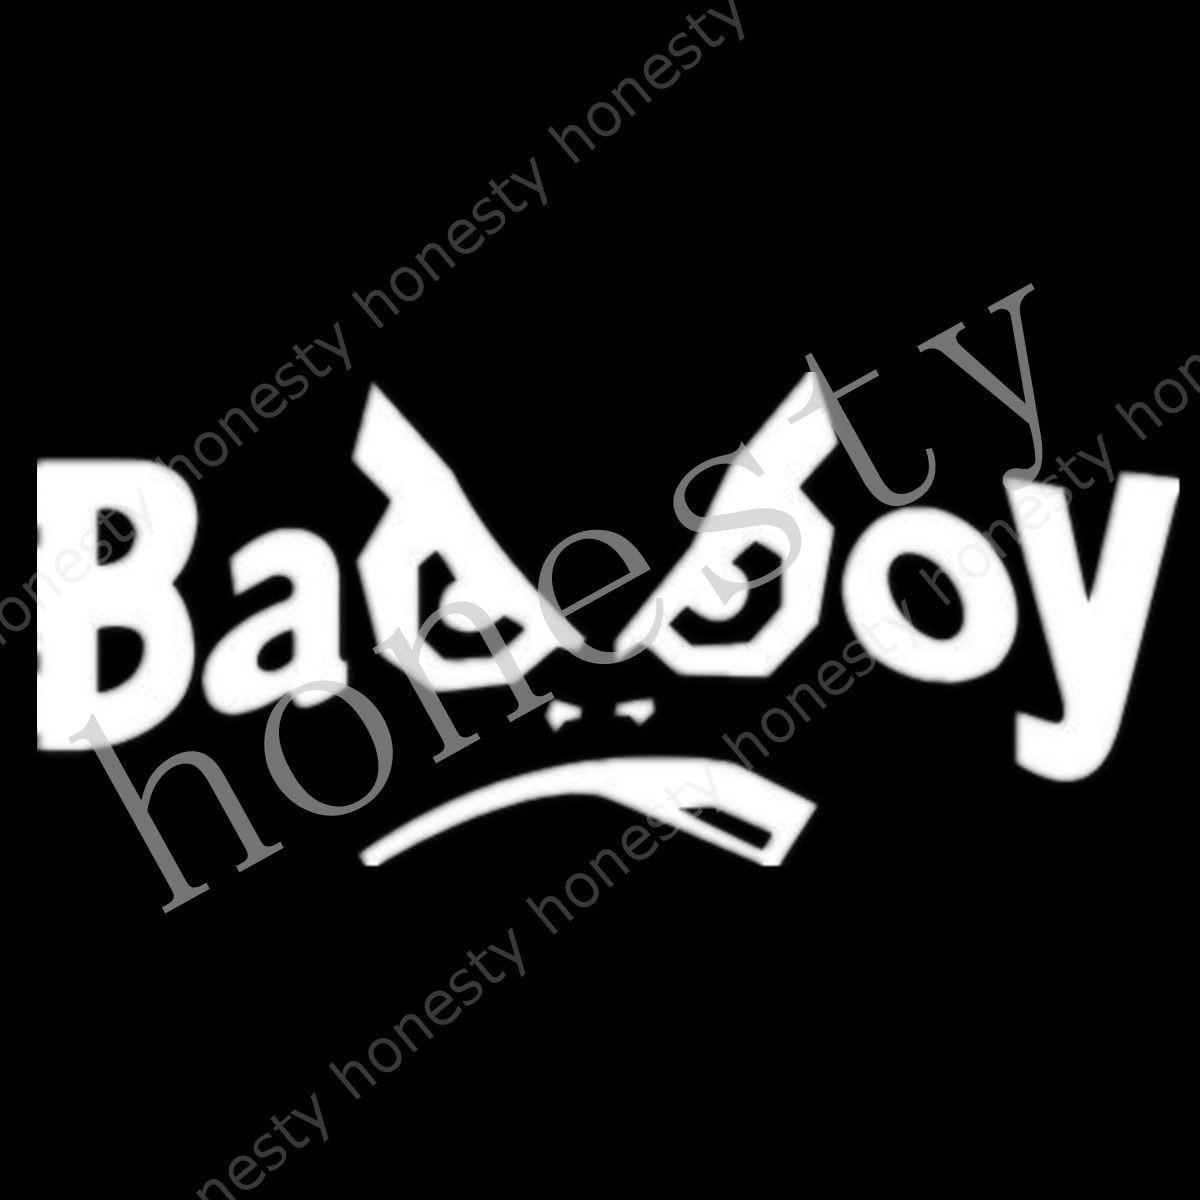 Bike sticker design online - Badboy Bad Boy Logo Sticker Evo Jdm Drift Vinyl Funny Dope Window Laptop Bike China